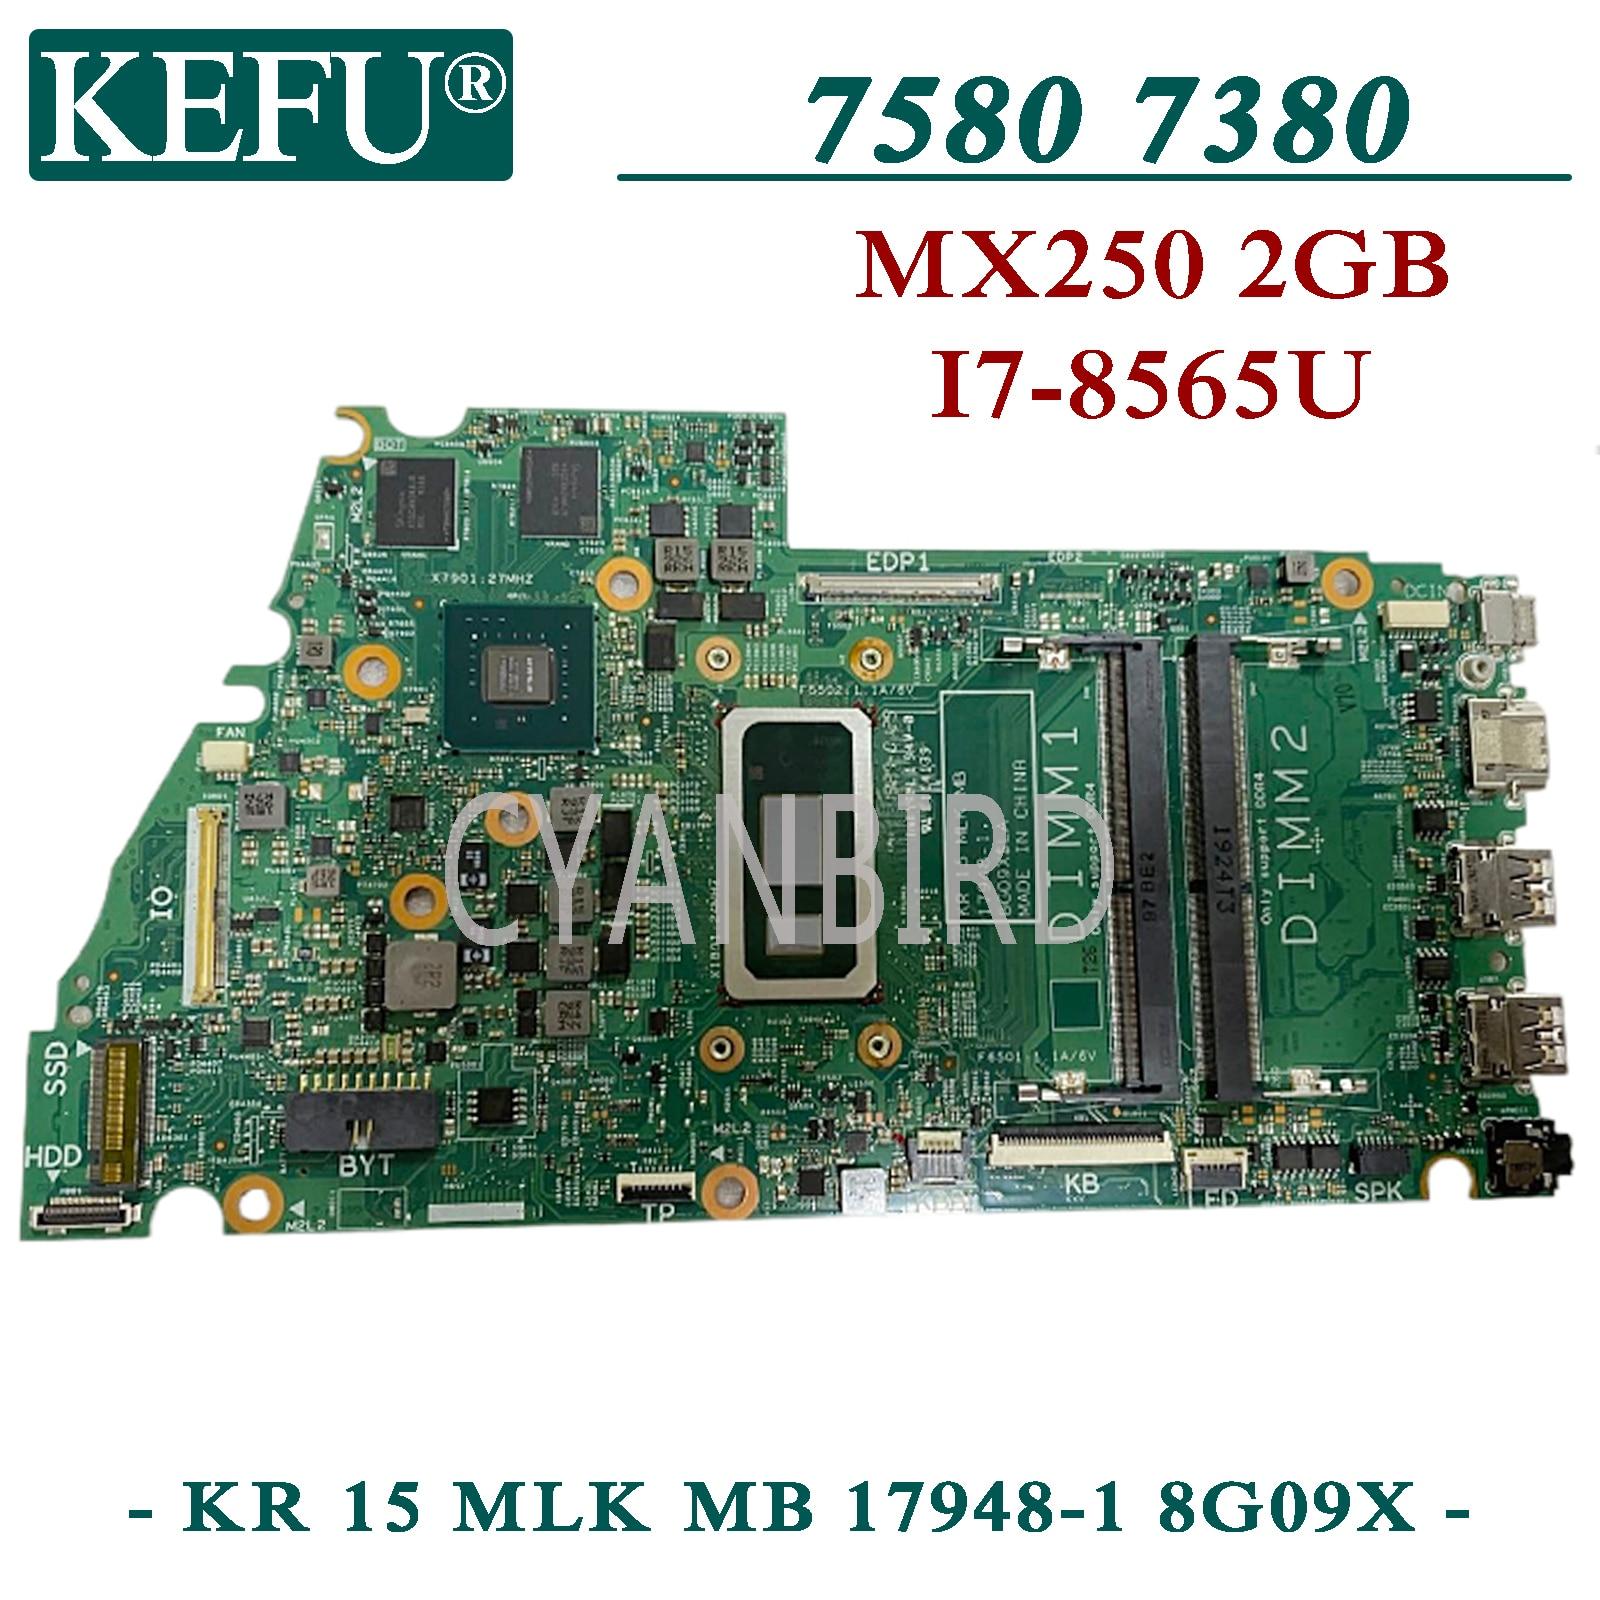 KEFU KR 15 MLK MB 17948-1 8G09X اللوحة الرئيسية الأصلية لديل انسبايرون 15-7580 13-7380 مع I7-8565U اللوحة الأم للكمبيوتر المحمول MX250-2GB